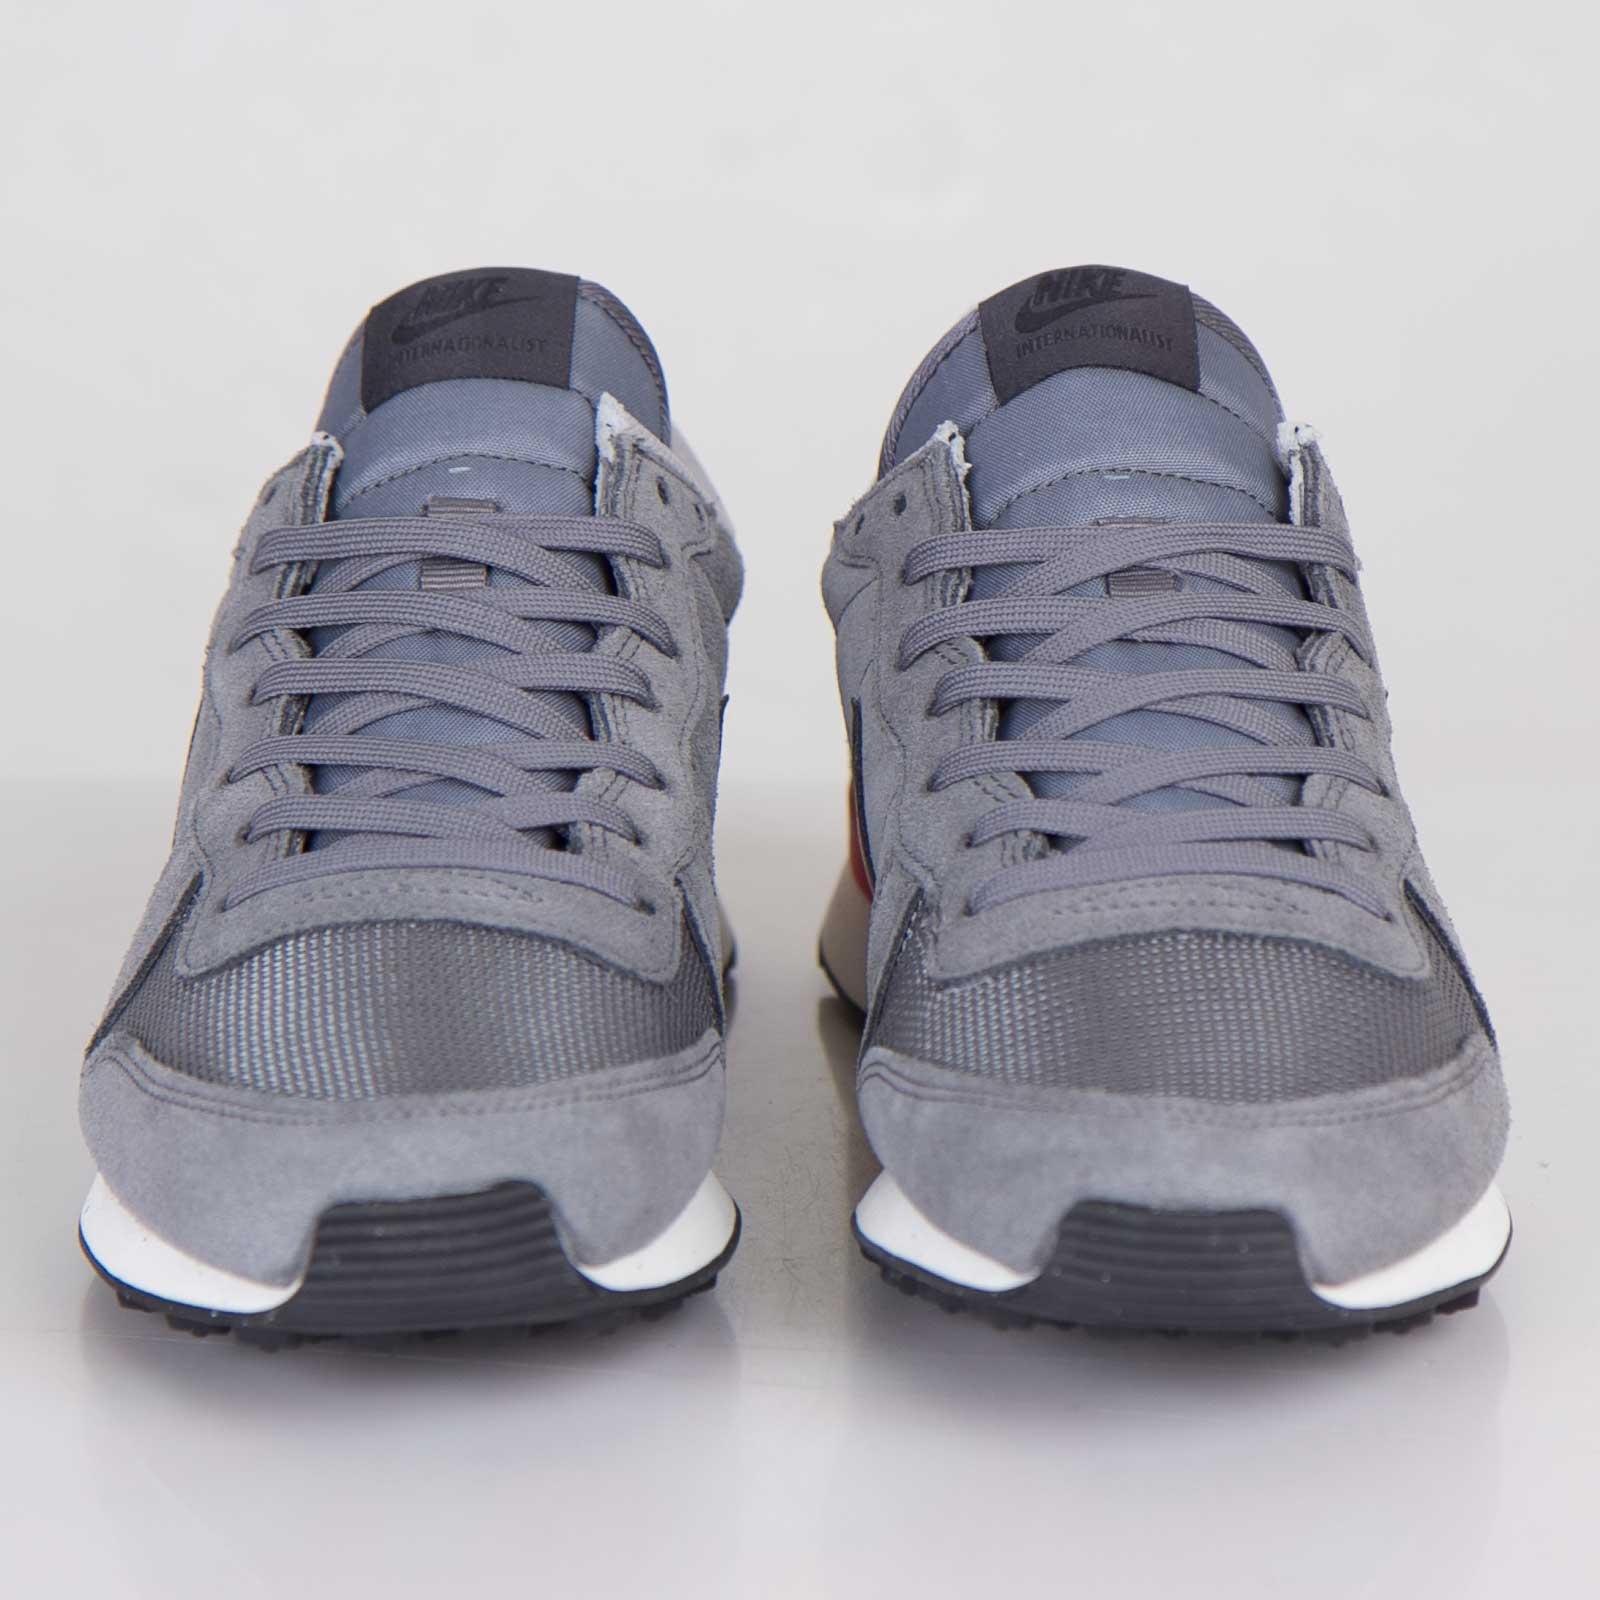 low priced fcb7f f93de Nike Internationalist Leather Nike Internationalist Leather ...